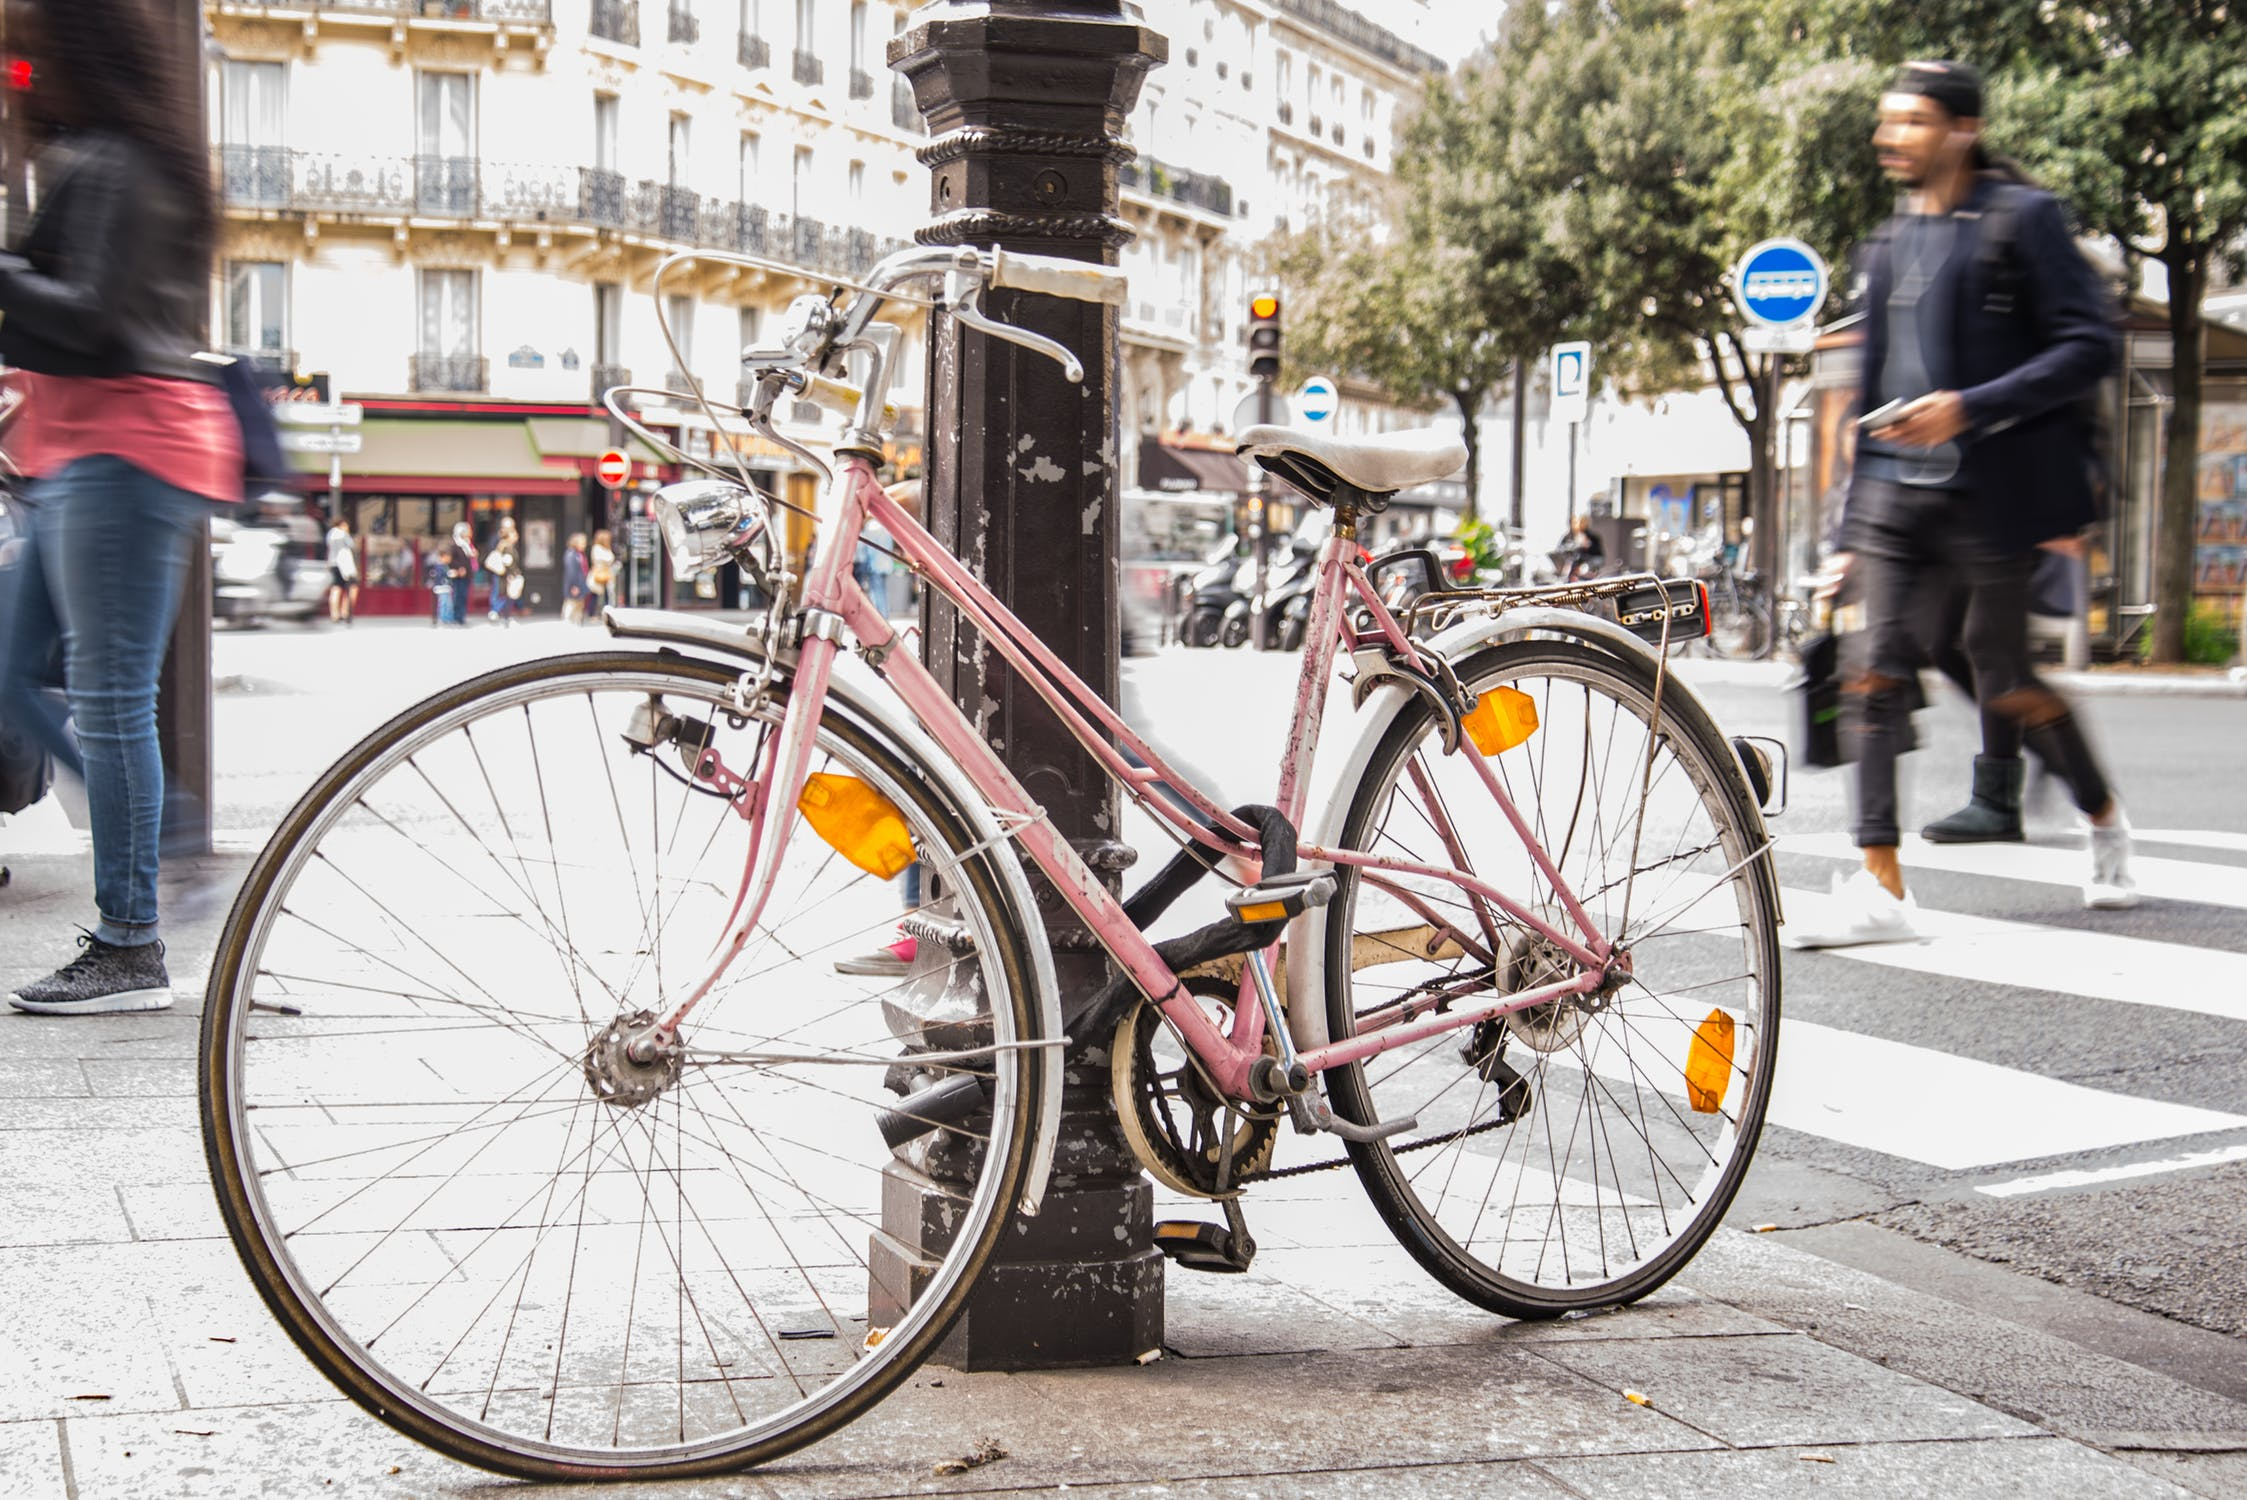 biking in Paris - All Luxury Apartments